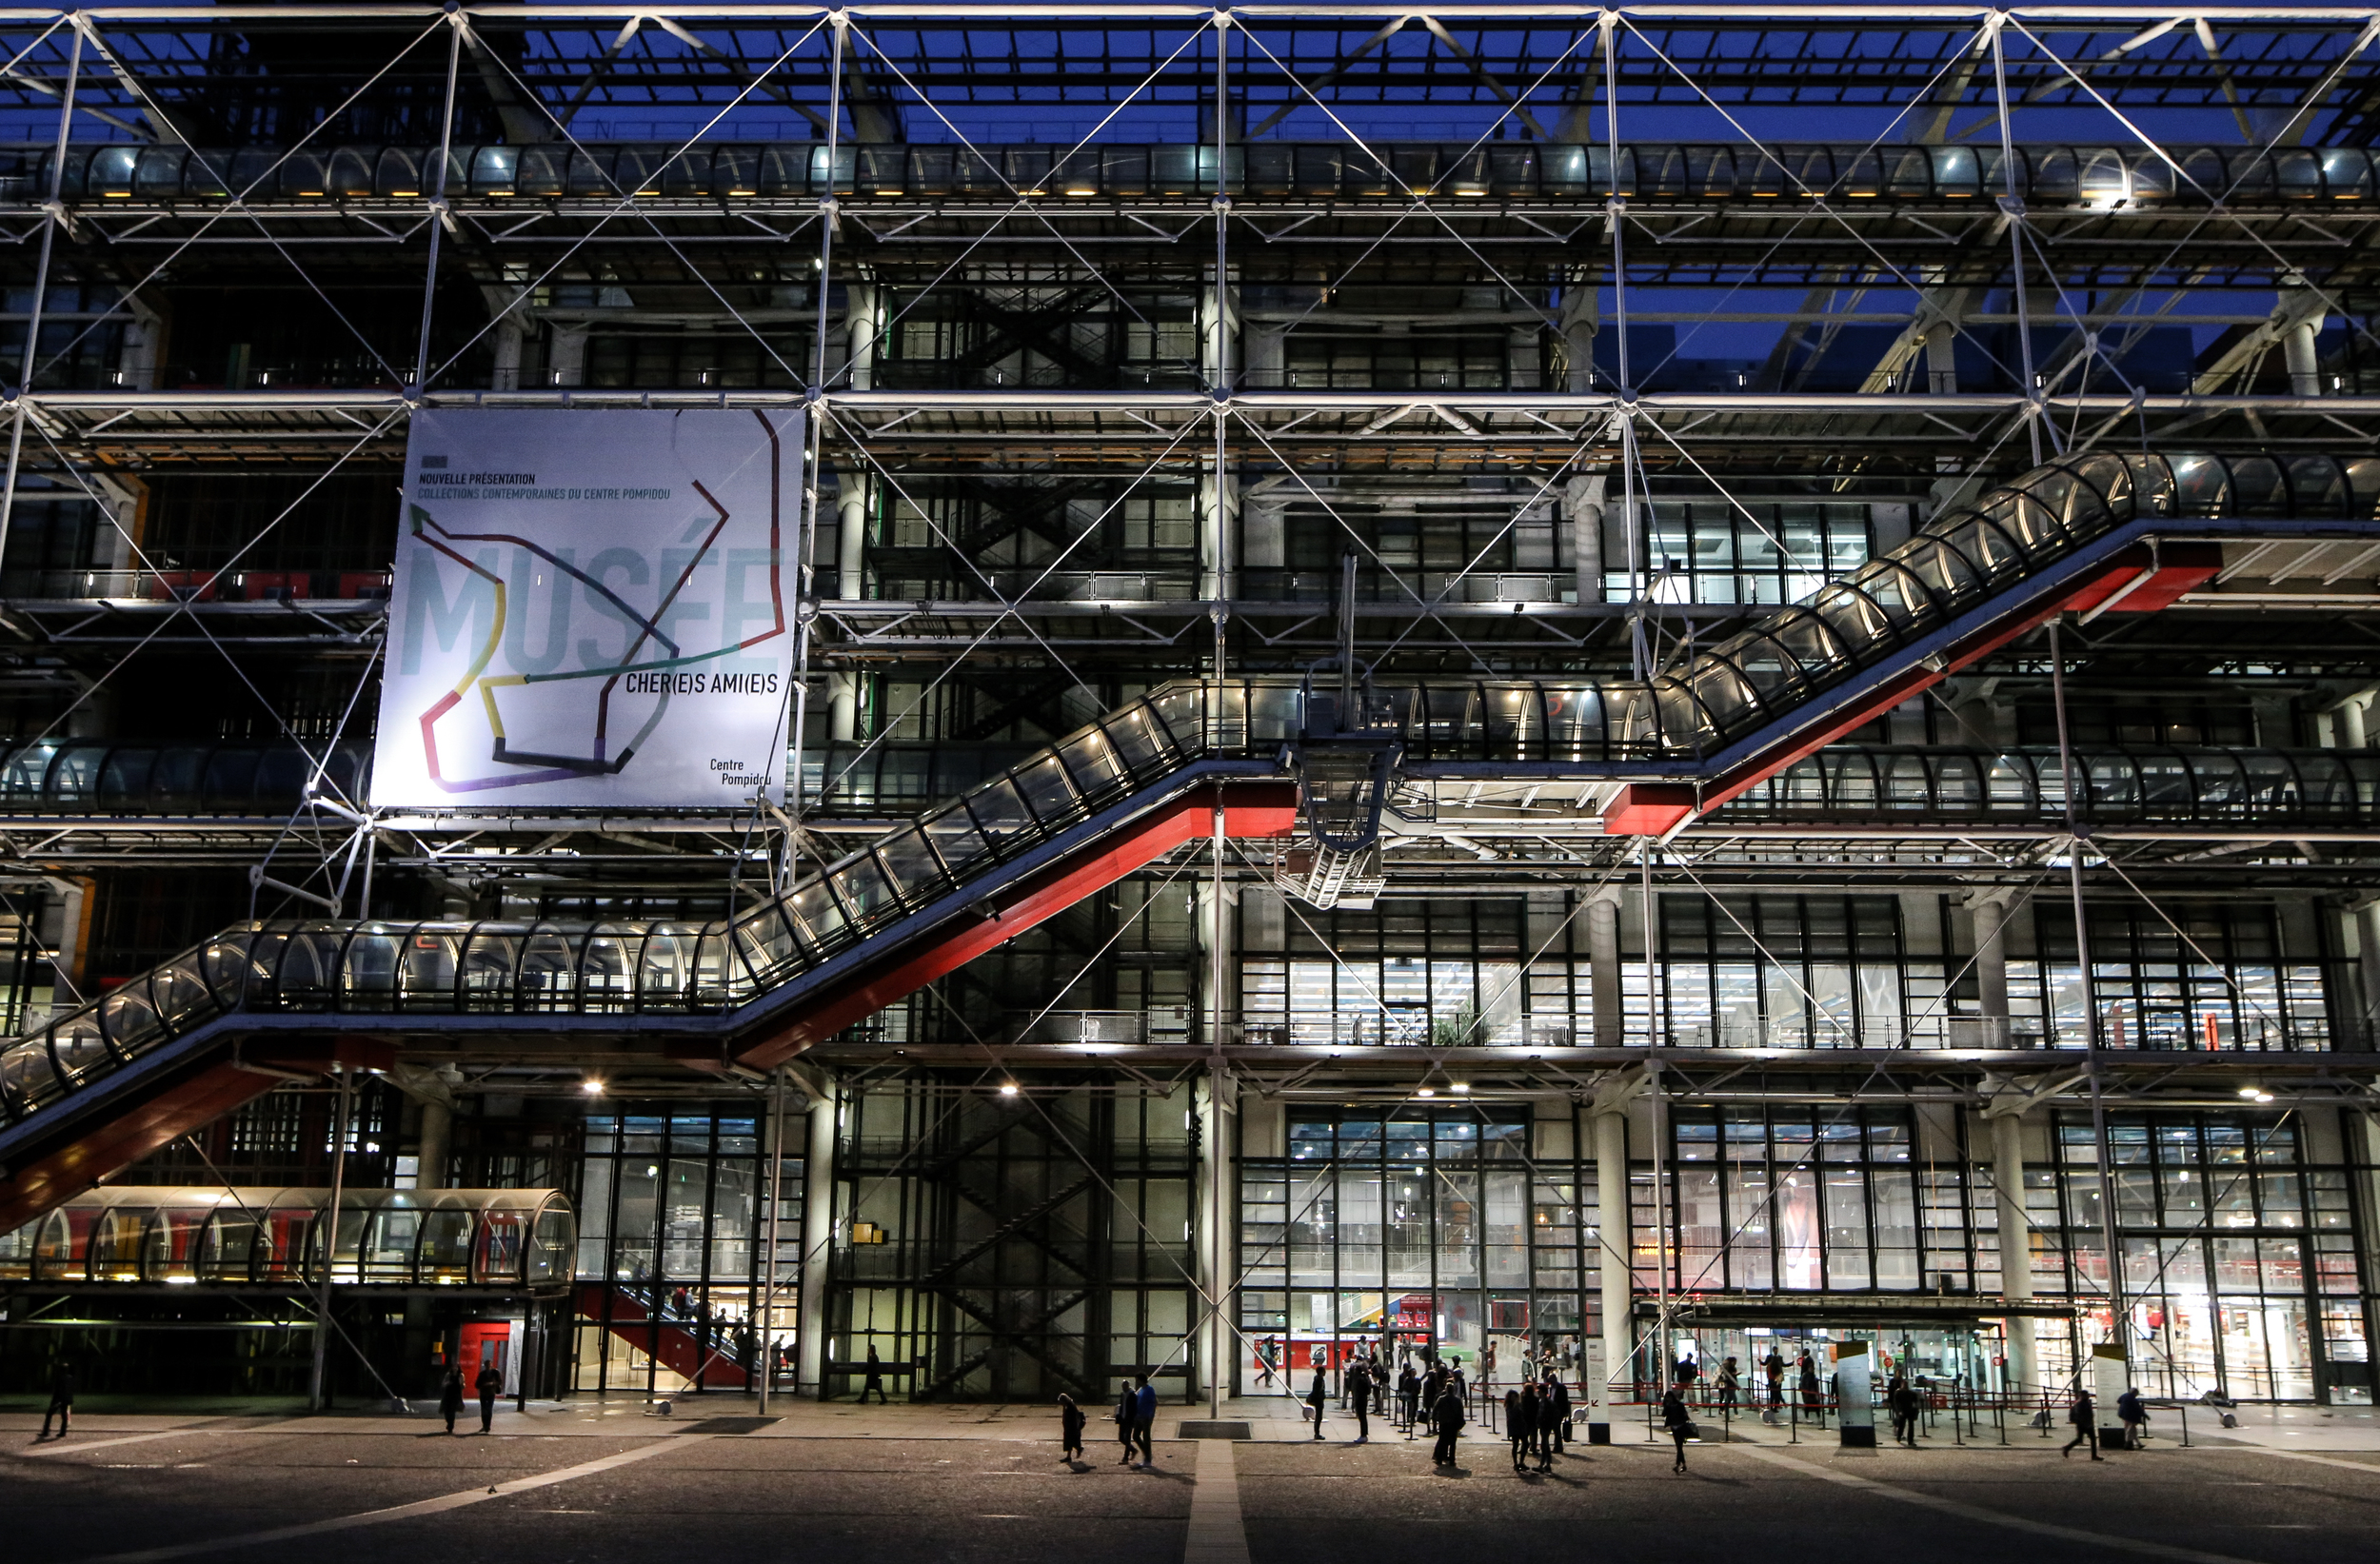 Centre Georges Pompidou - Paris, France - Renzo Piano, Richard Rogers, Peter Rice, Gianfranco Franchini, Mike Davies